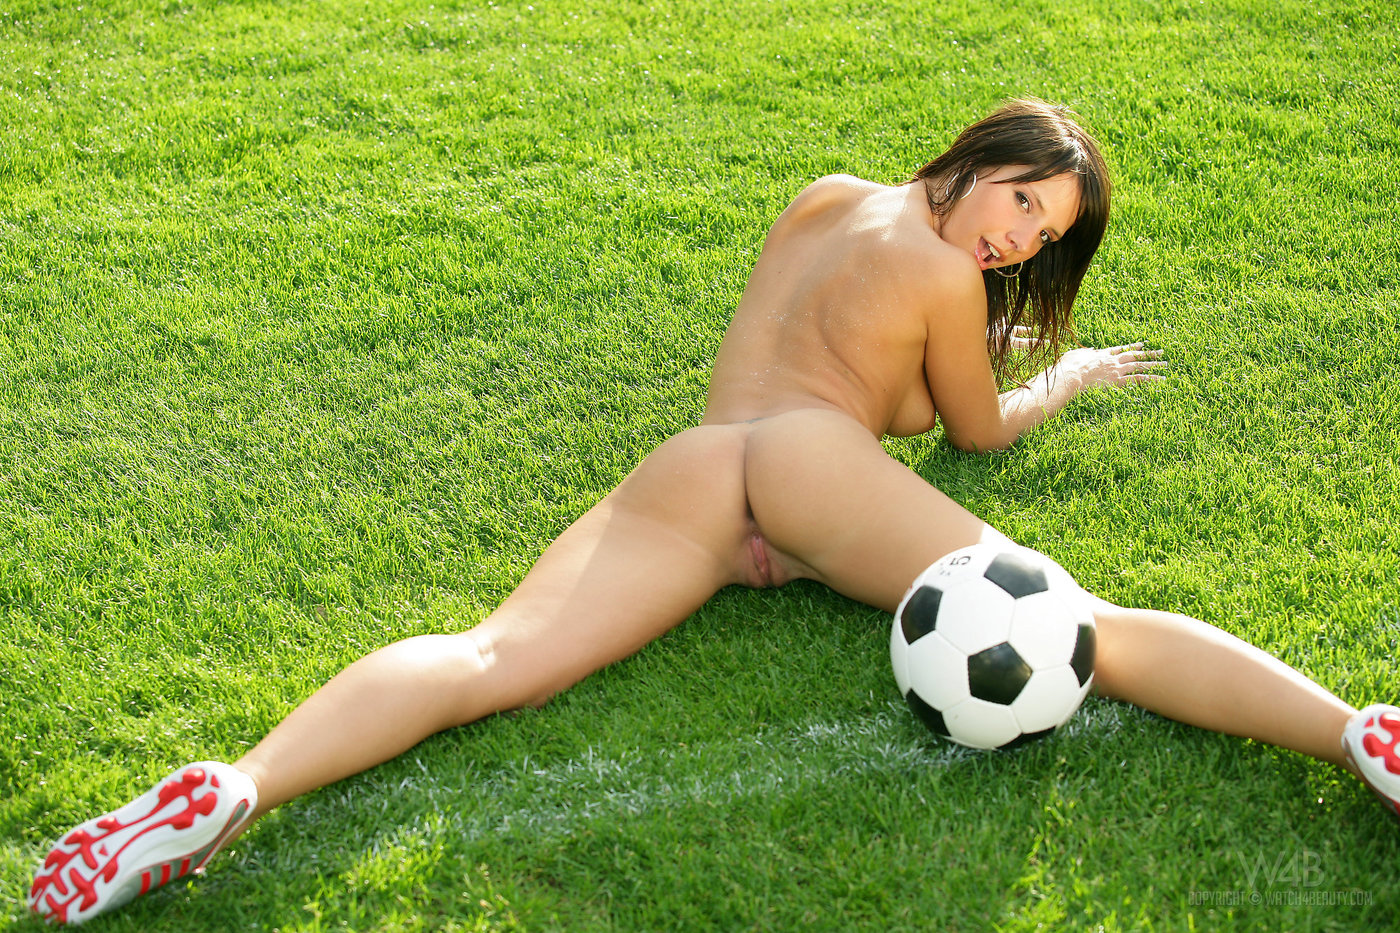 Football hotties nude blowjob, forced lesbian sex porn videos